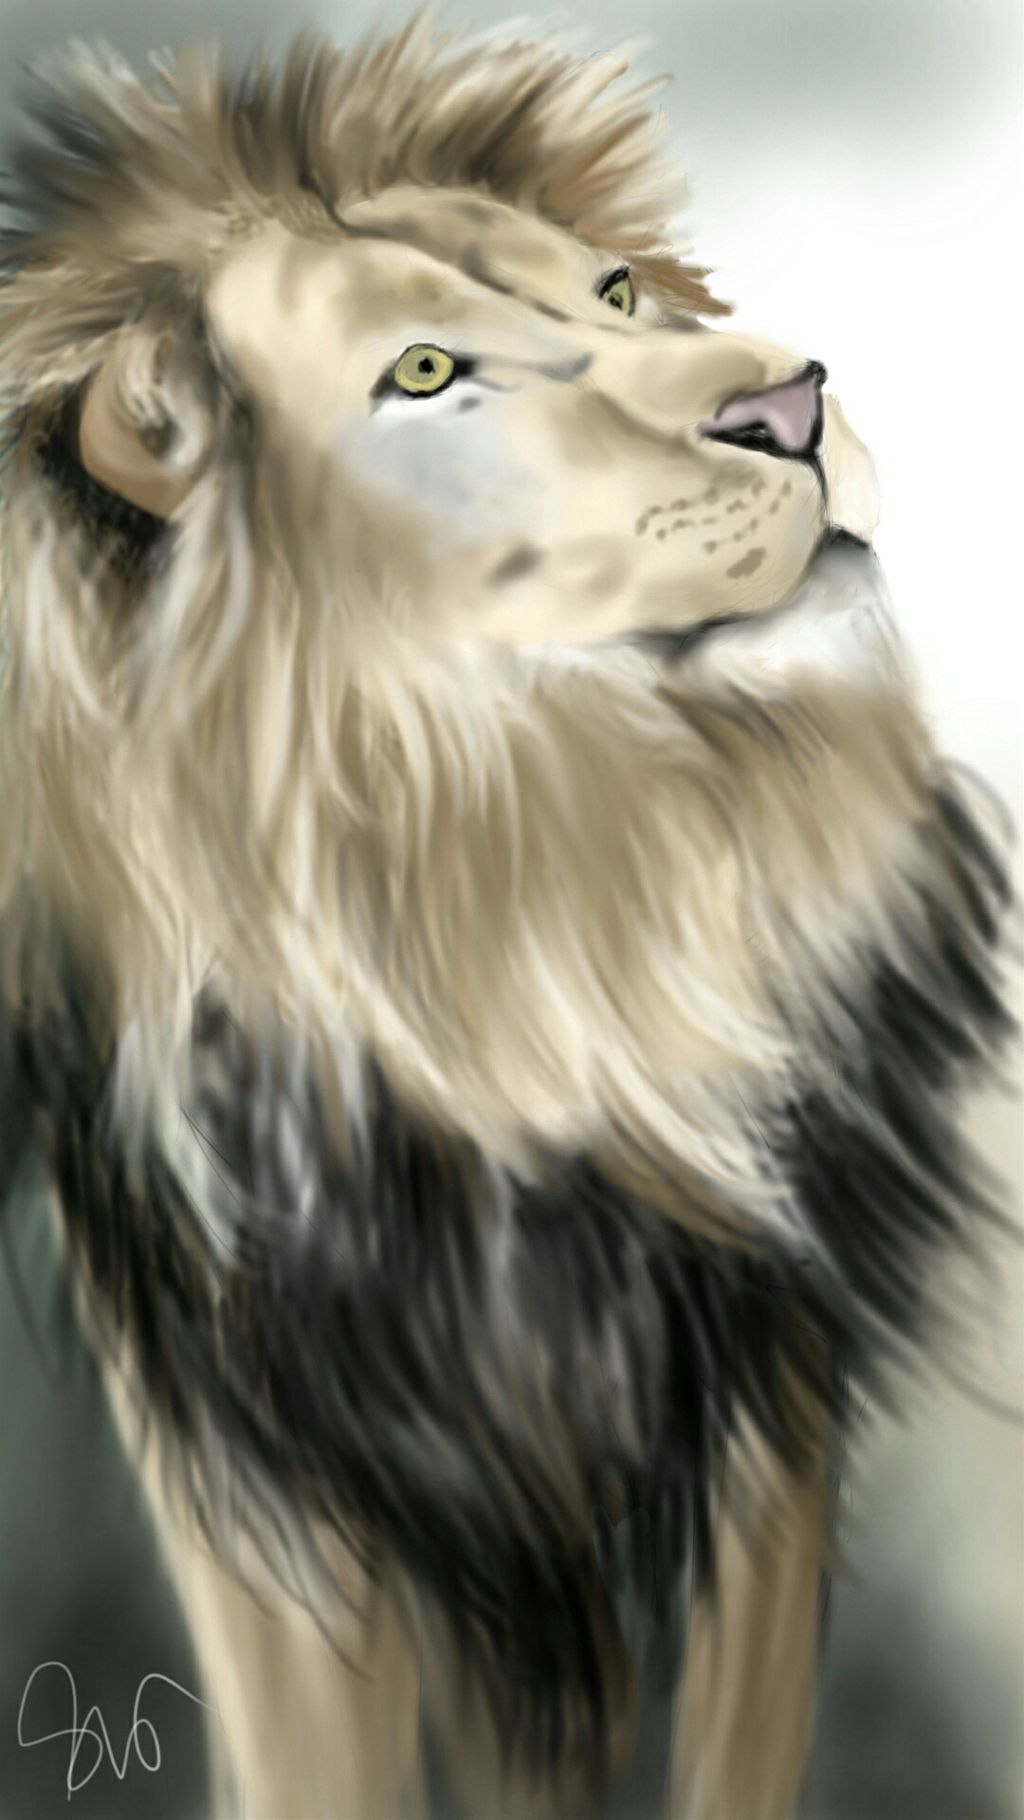 The King #petsandanimals  #drawing  #digitaldrawing   #nature